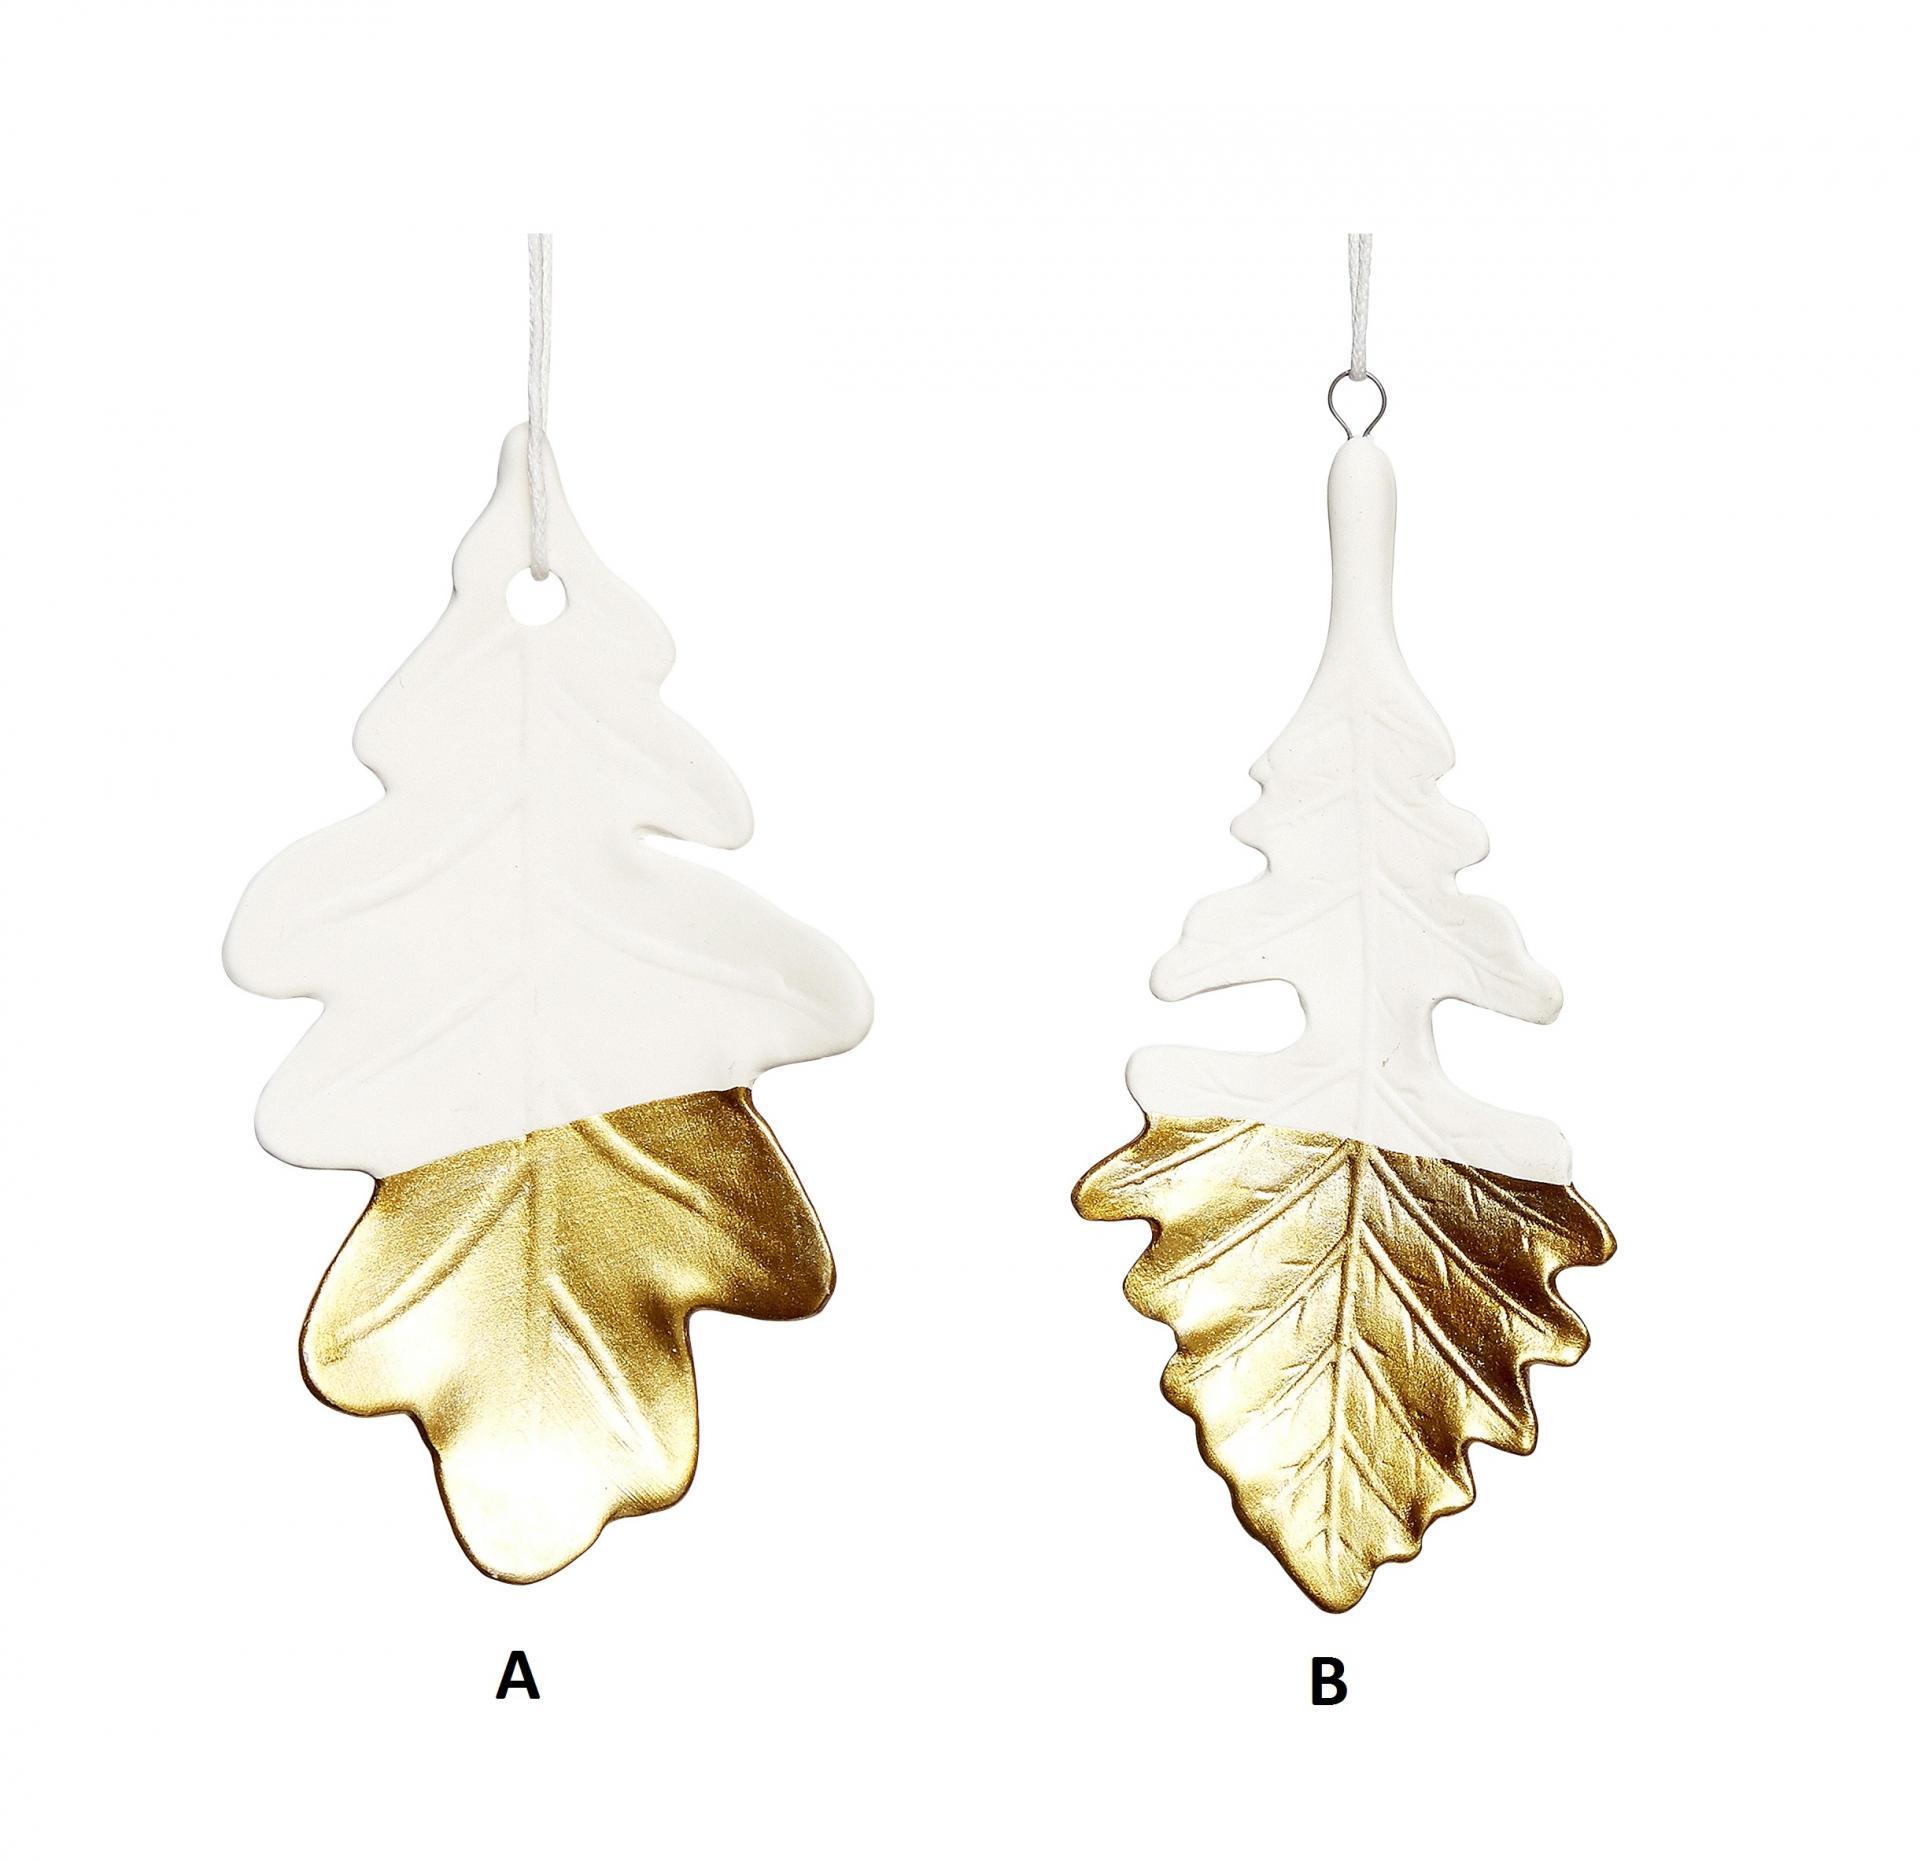 Hübsch Porcelánová ozdoba Leaf White/gold Typ A, bílá barva, zlatá barva, porcelán